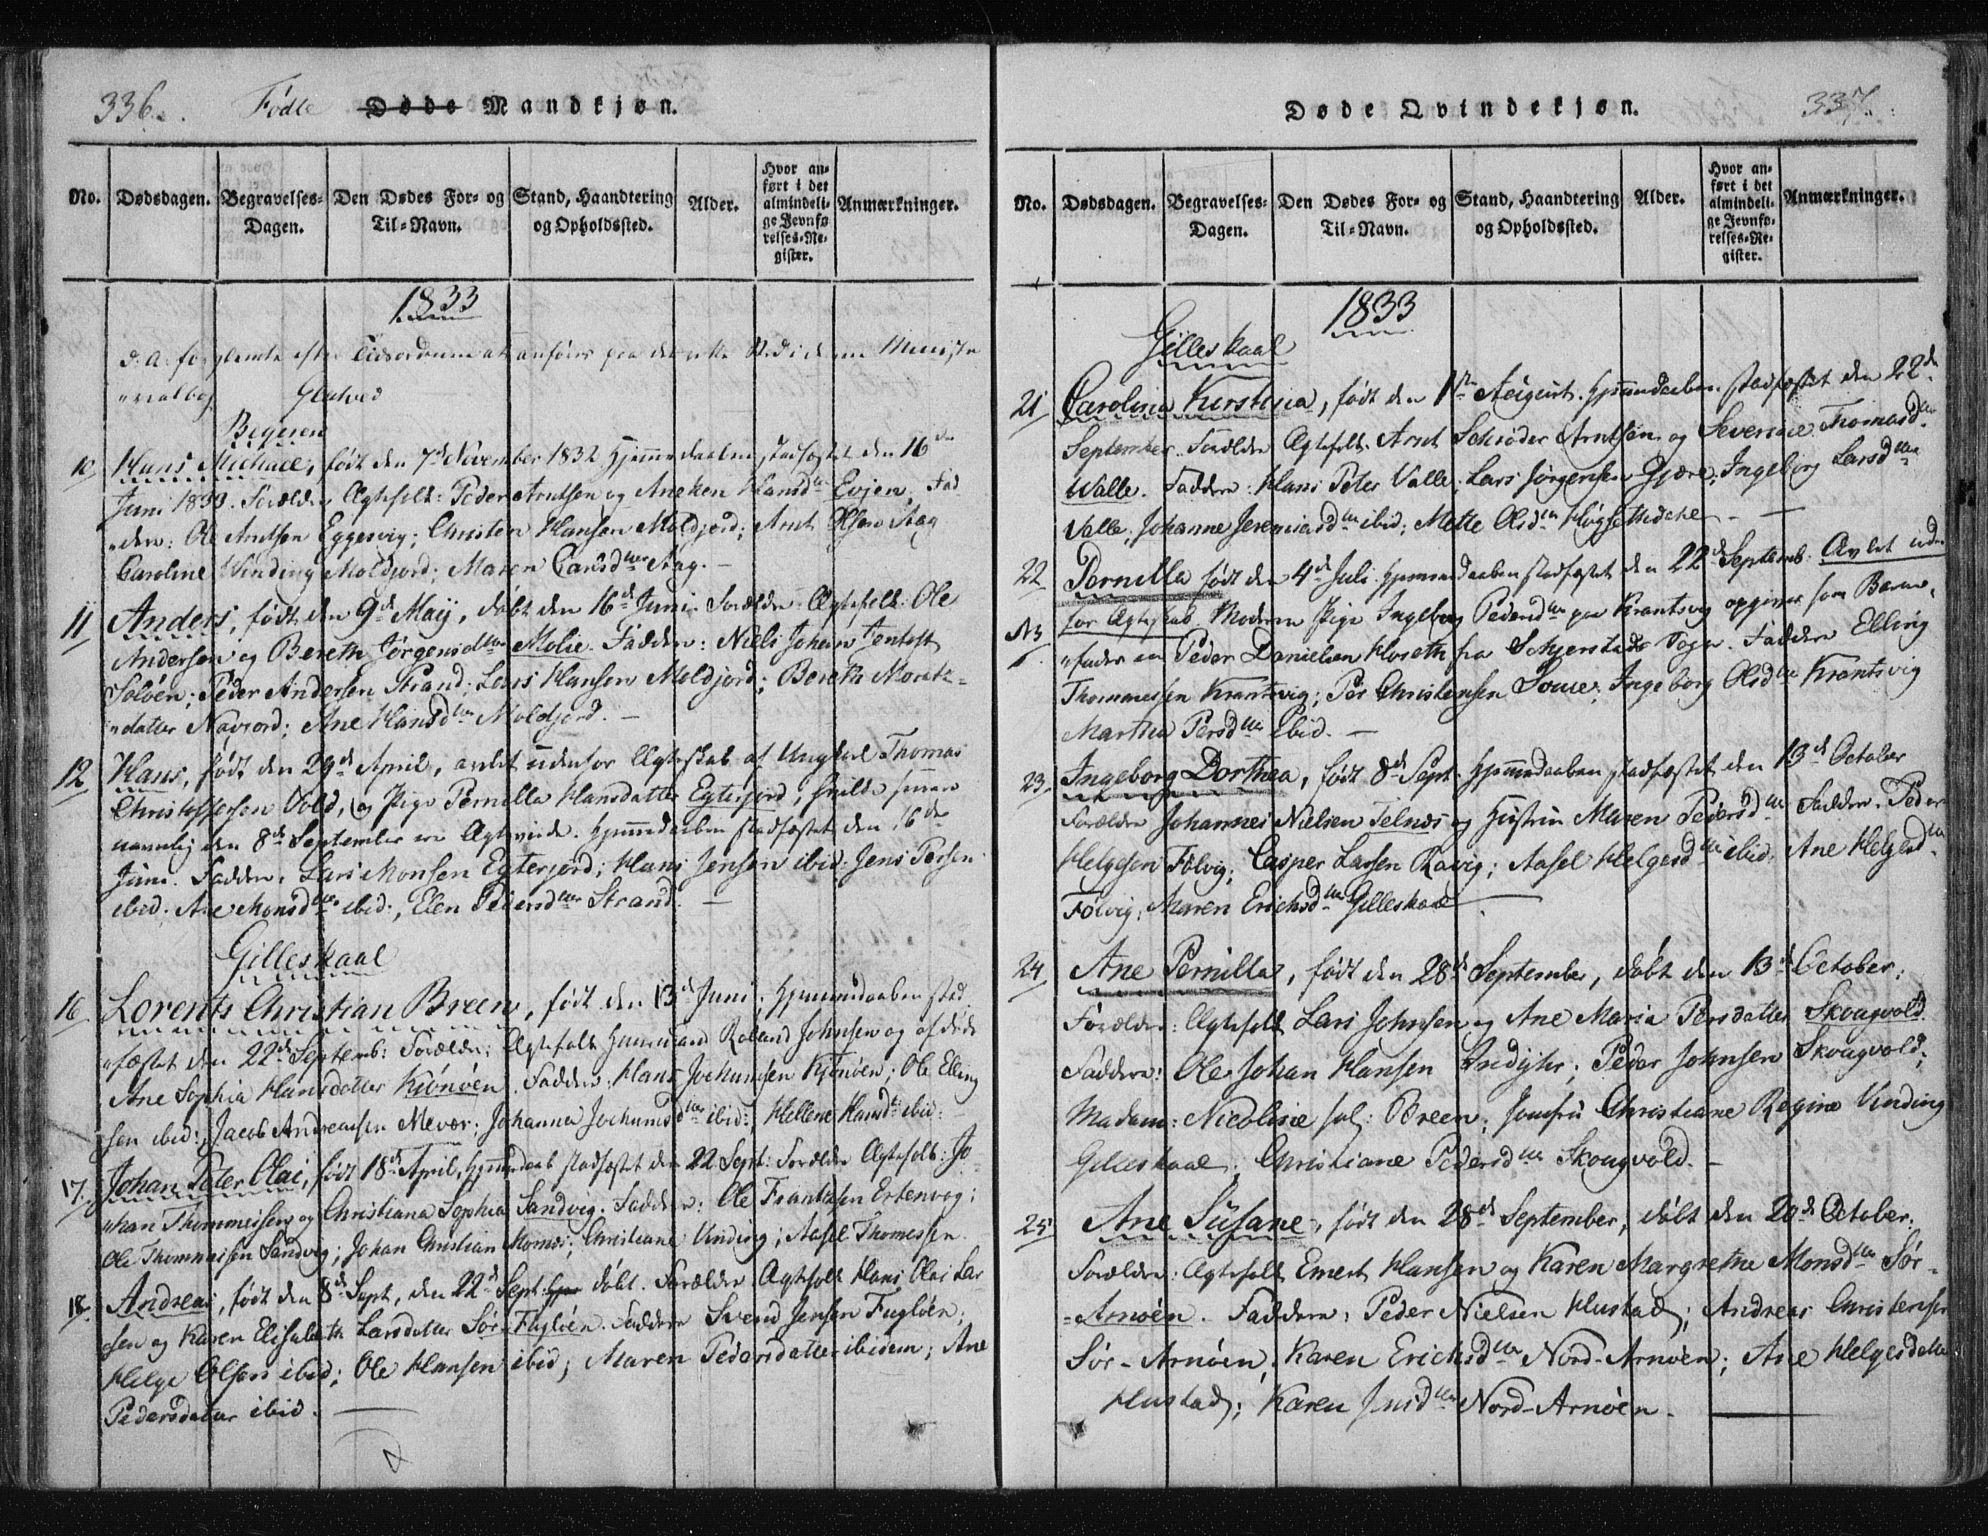 SAT, Ministerialprotokoller, klokkerbøker og fødselsregistre - Nordland, 805/L0096: Ministerialbok nr. 805A03, 1820-1837, s. 336-337